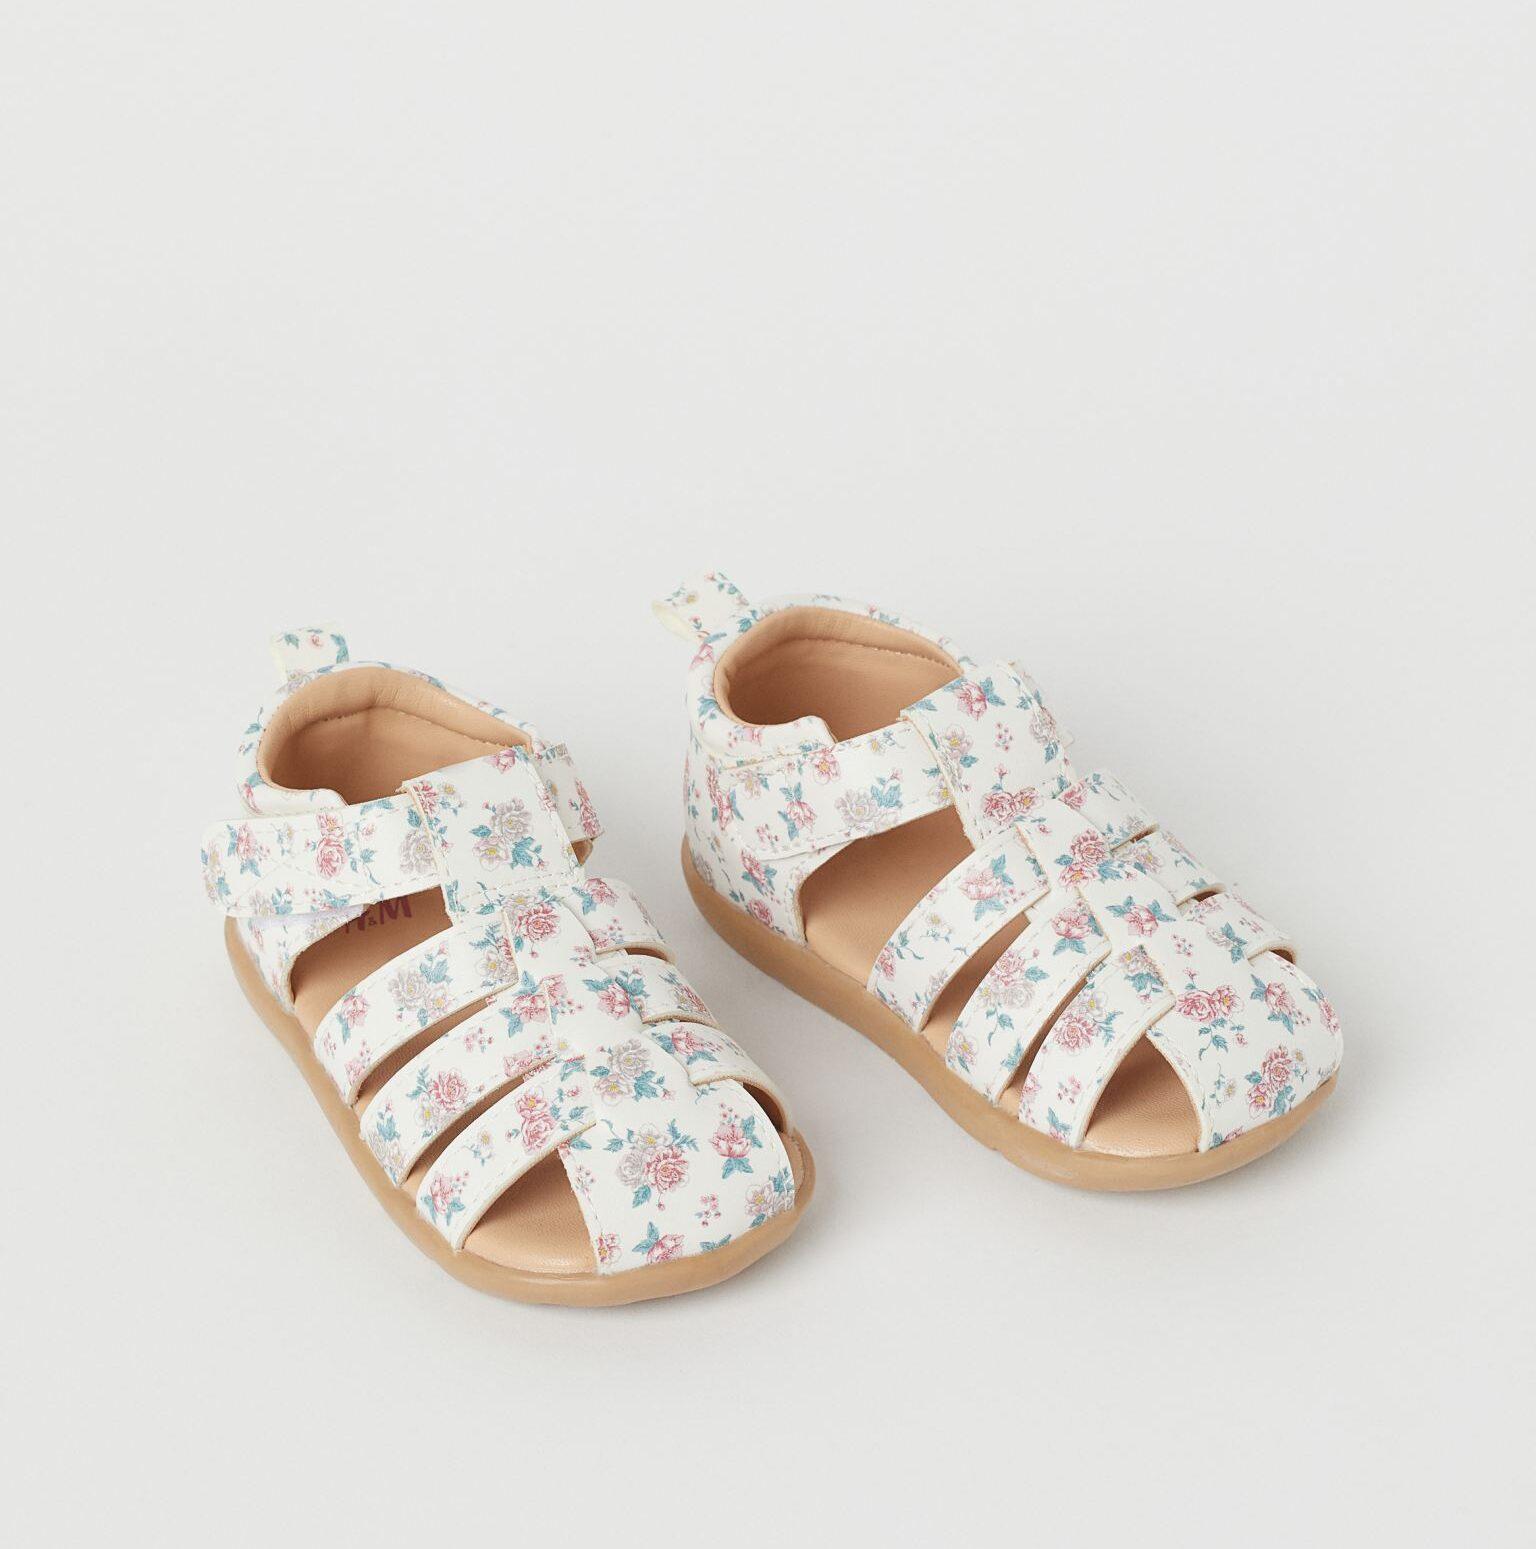 H&M Kids White Floral Sandals